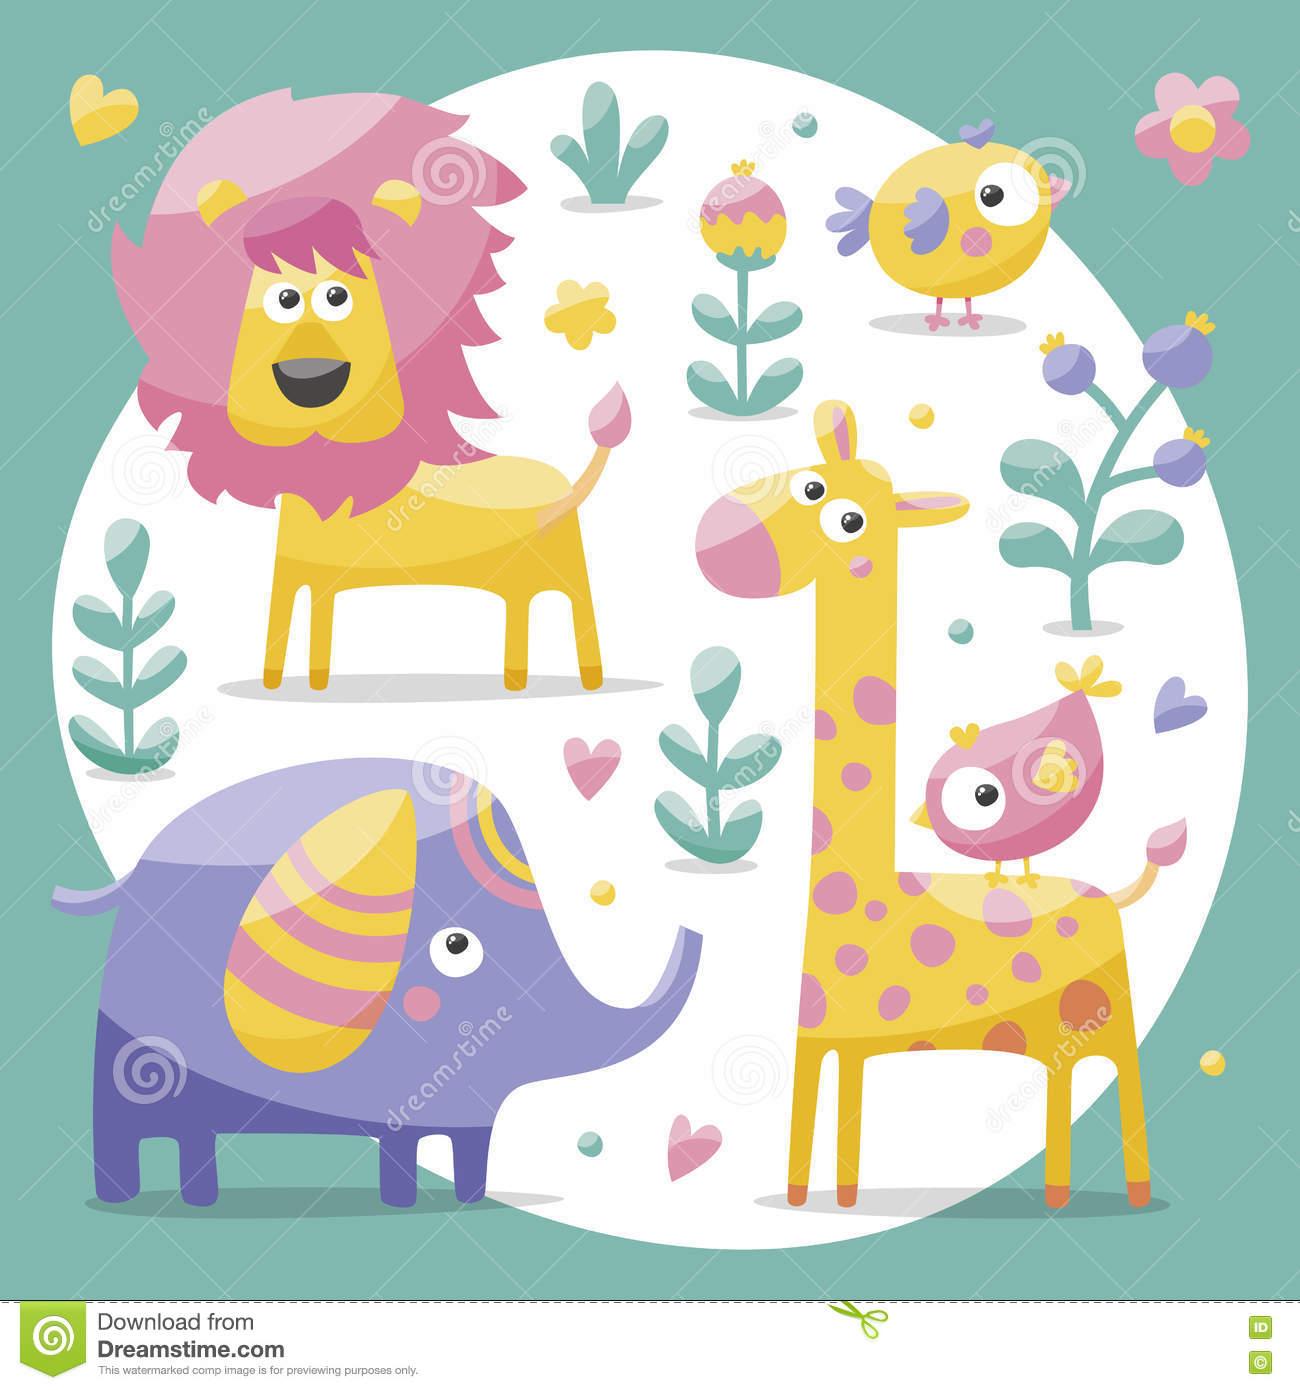 Cute Set With Elephants, Lion,giraffe, Birds, Plants, Jungle.